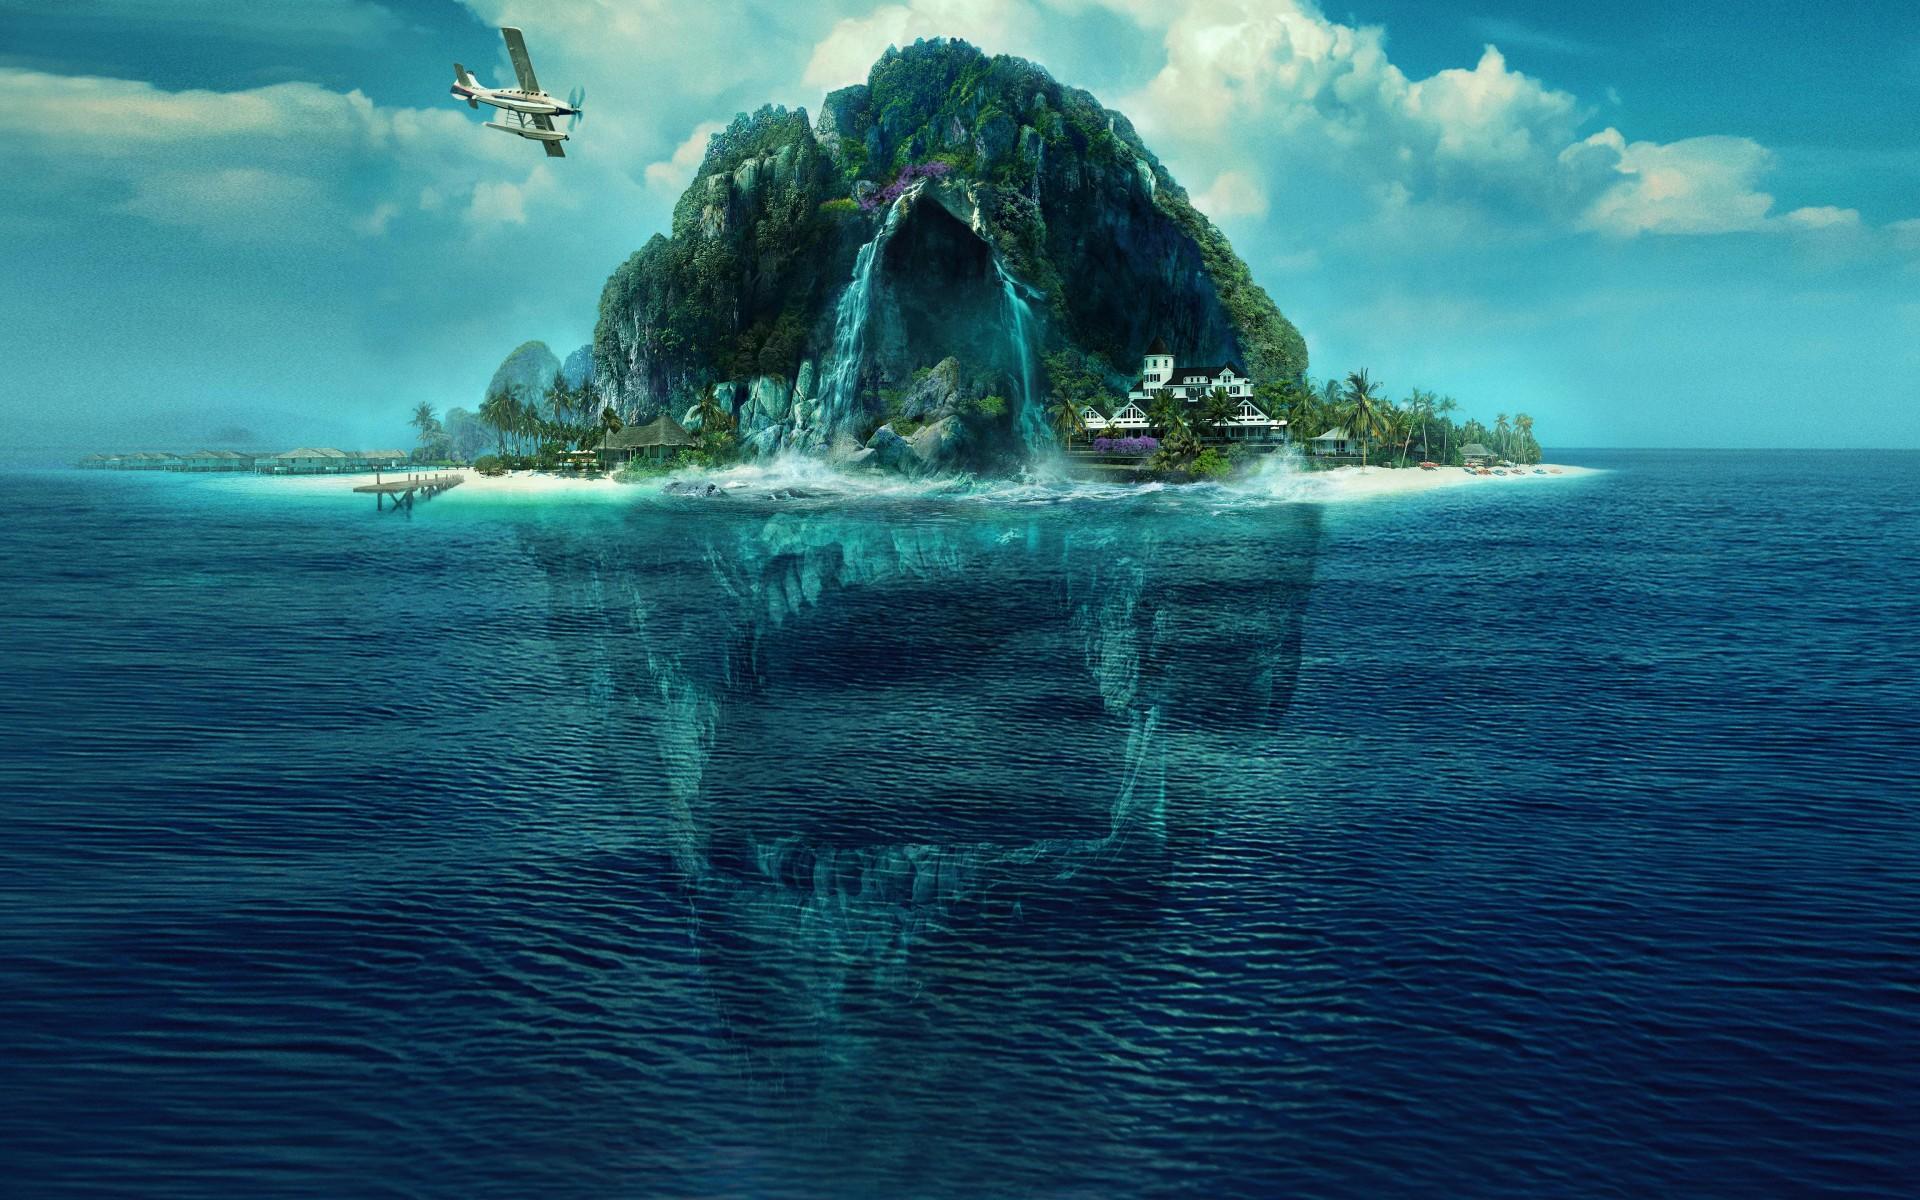 Fantasy Island 2020 4K 5K HD desktop wallpaper Widescreen High 1920x1200